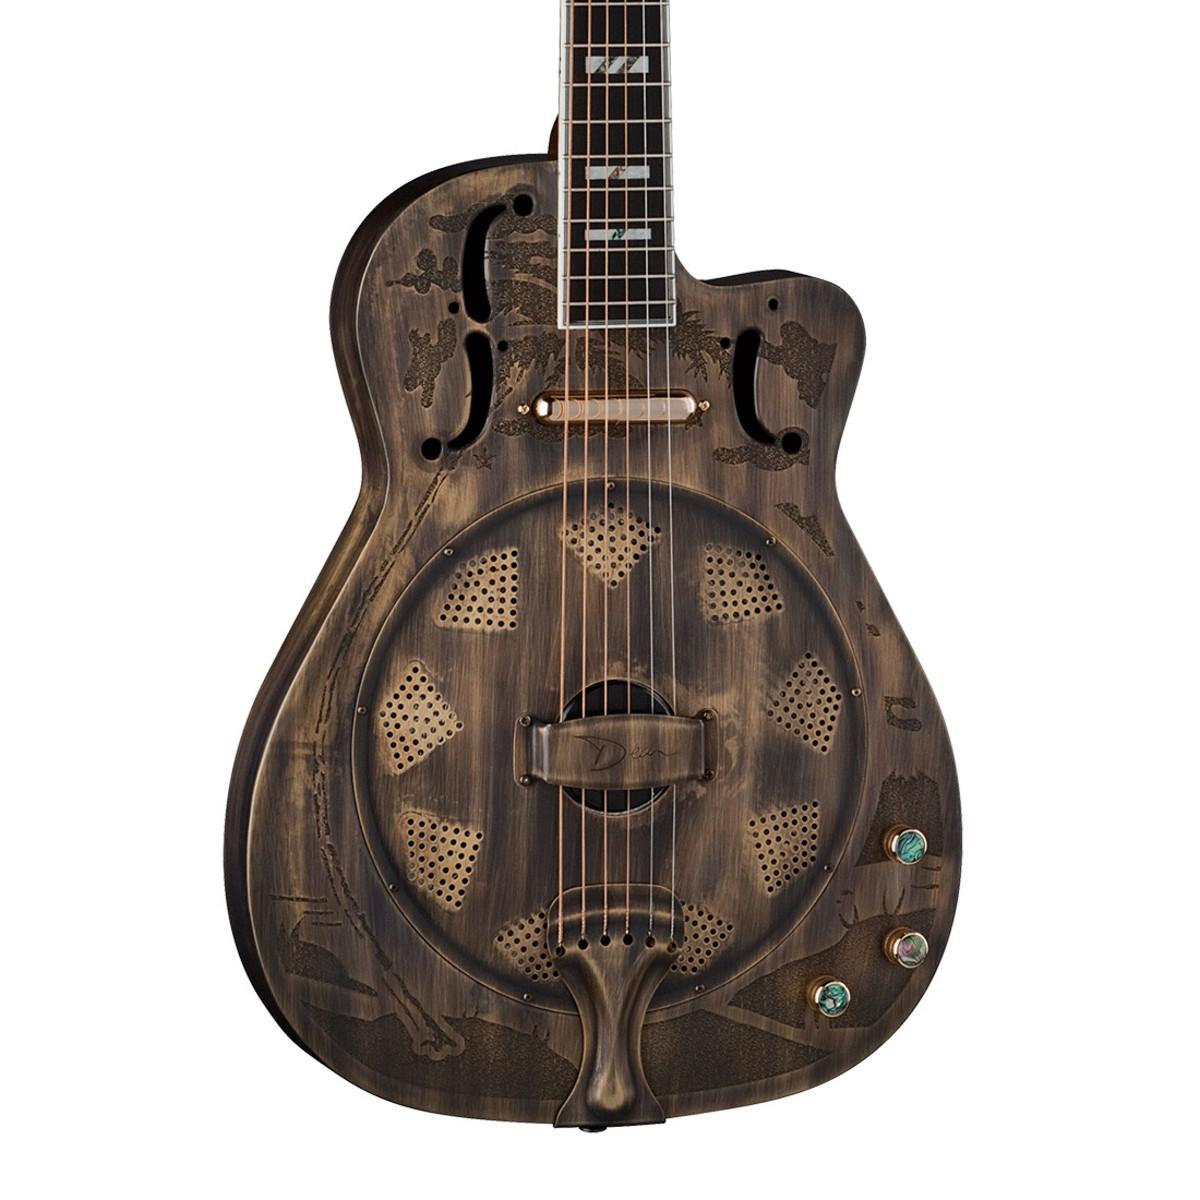 dean resonator thin body electric resonantor guitar brass b stock at gear4music. Black Bedroom Furniture Sets. Home Design Ideas